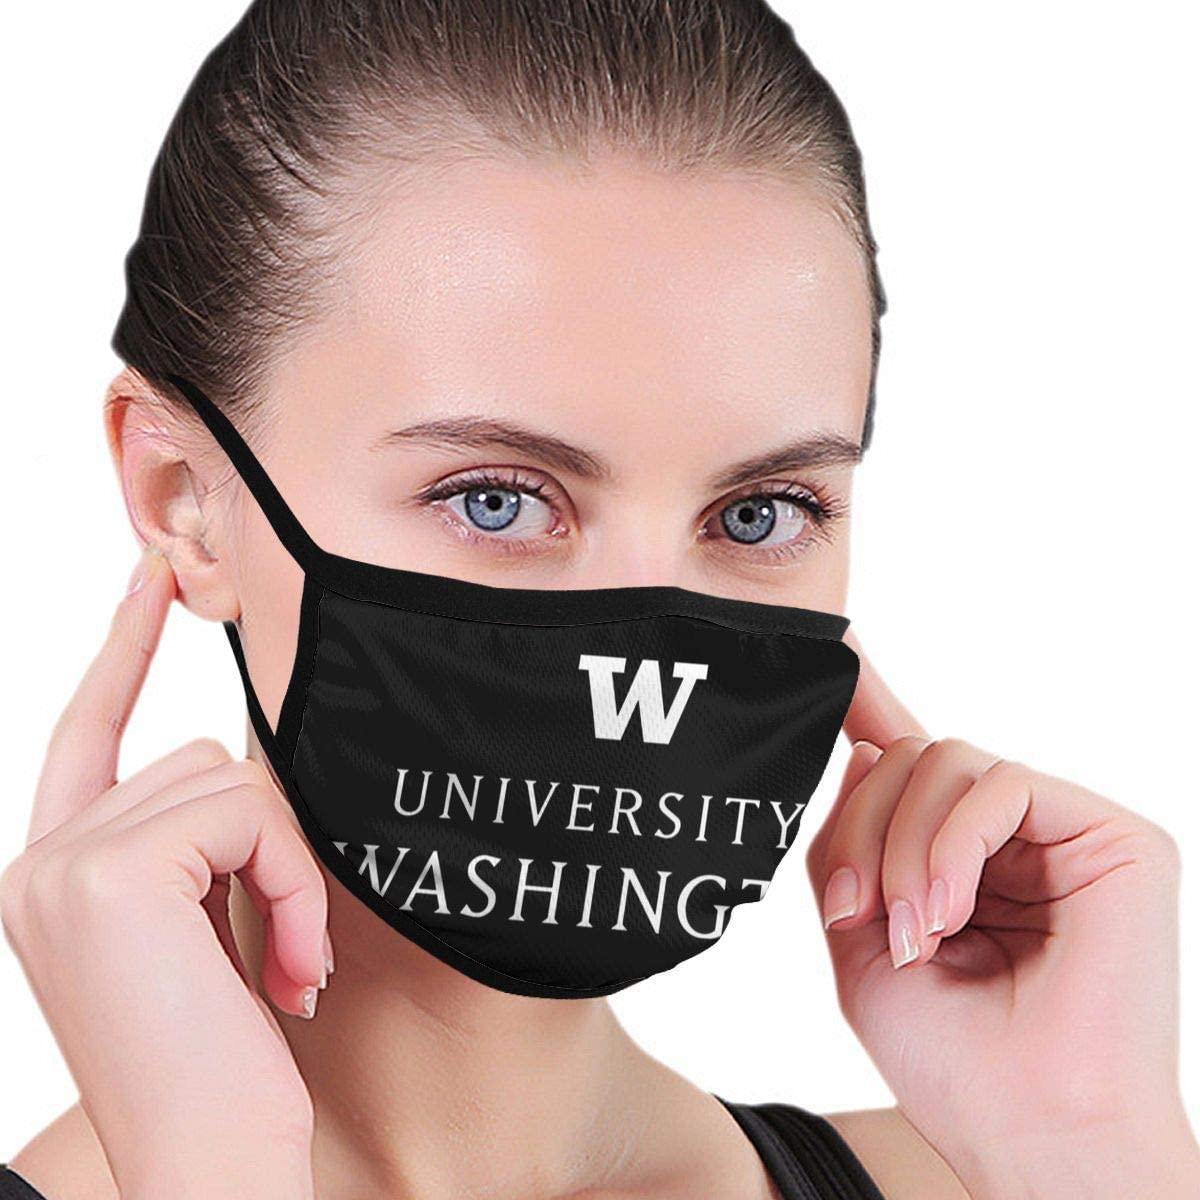 Uw Commemorate Outdoor Decorative Face Protection Face Cover Bandana Gaiter Balaclava Scarf Headwear